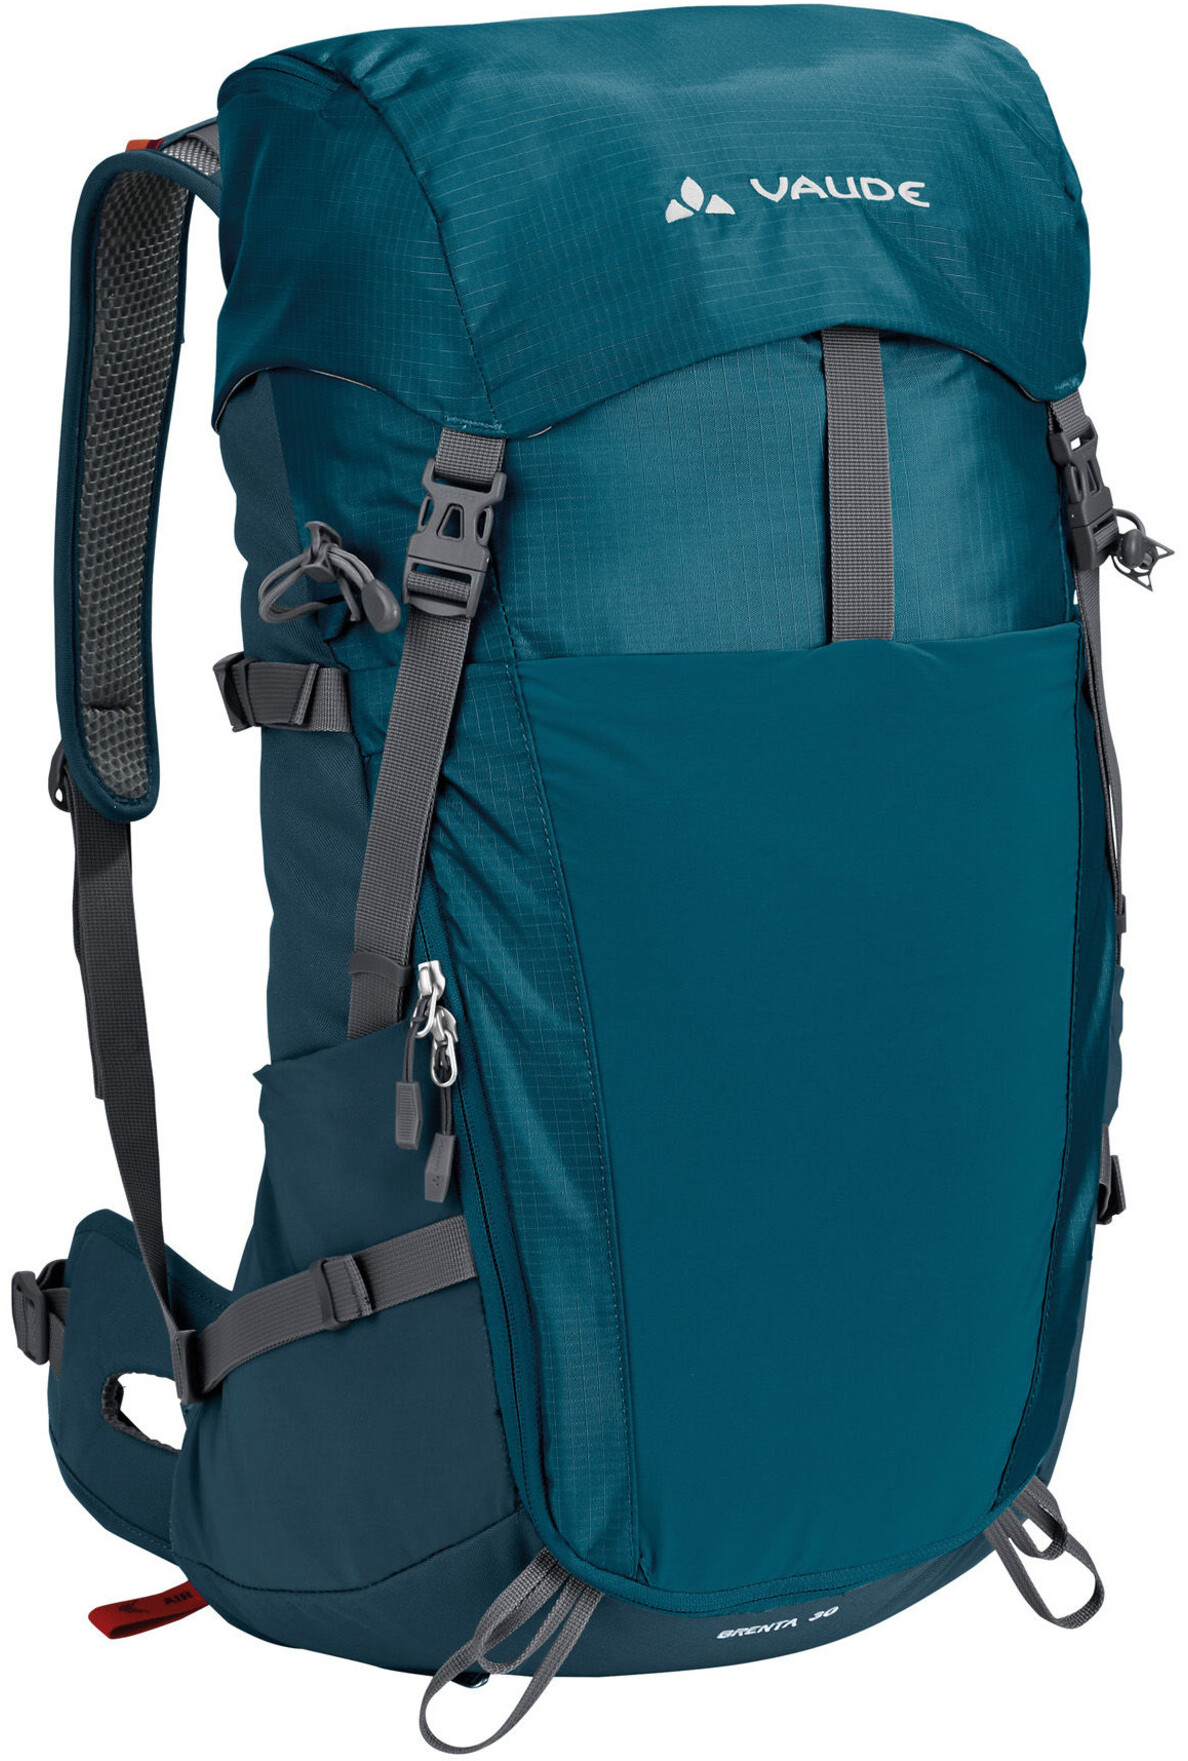 VAUDE Brenta 25 Backpack blue sapphire - addnature.com 979c57afb87f4